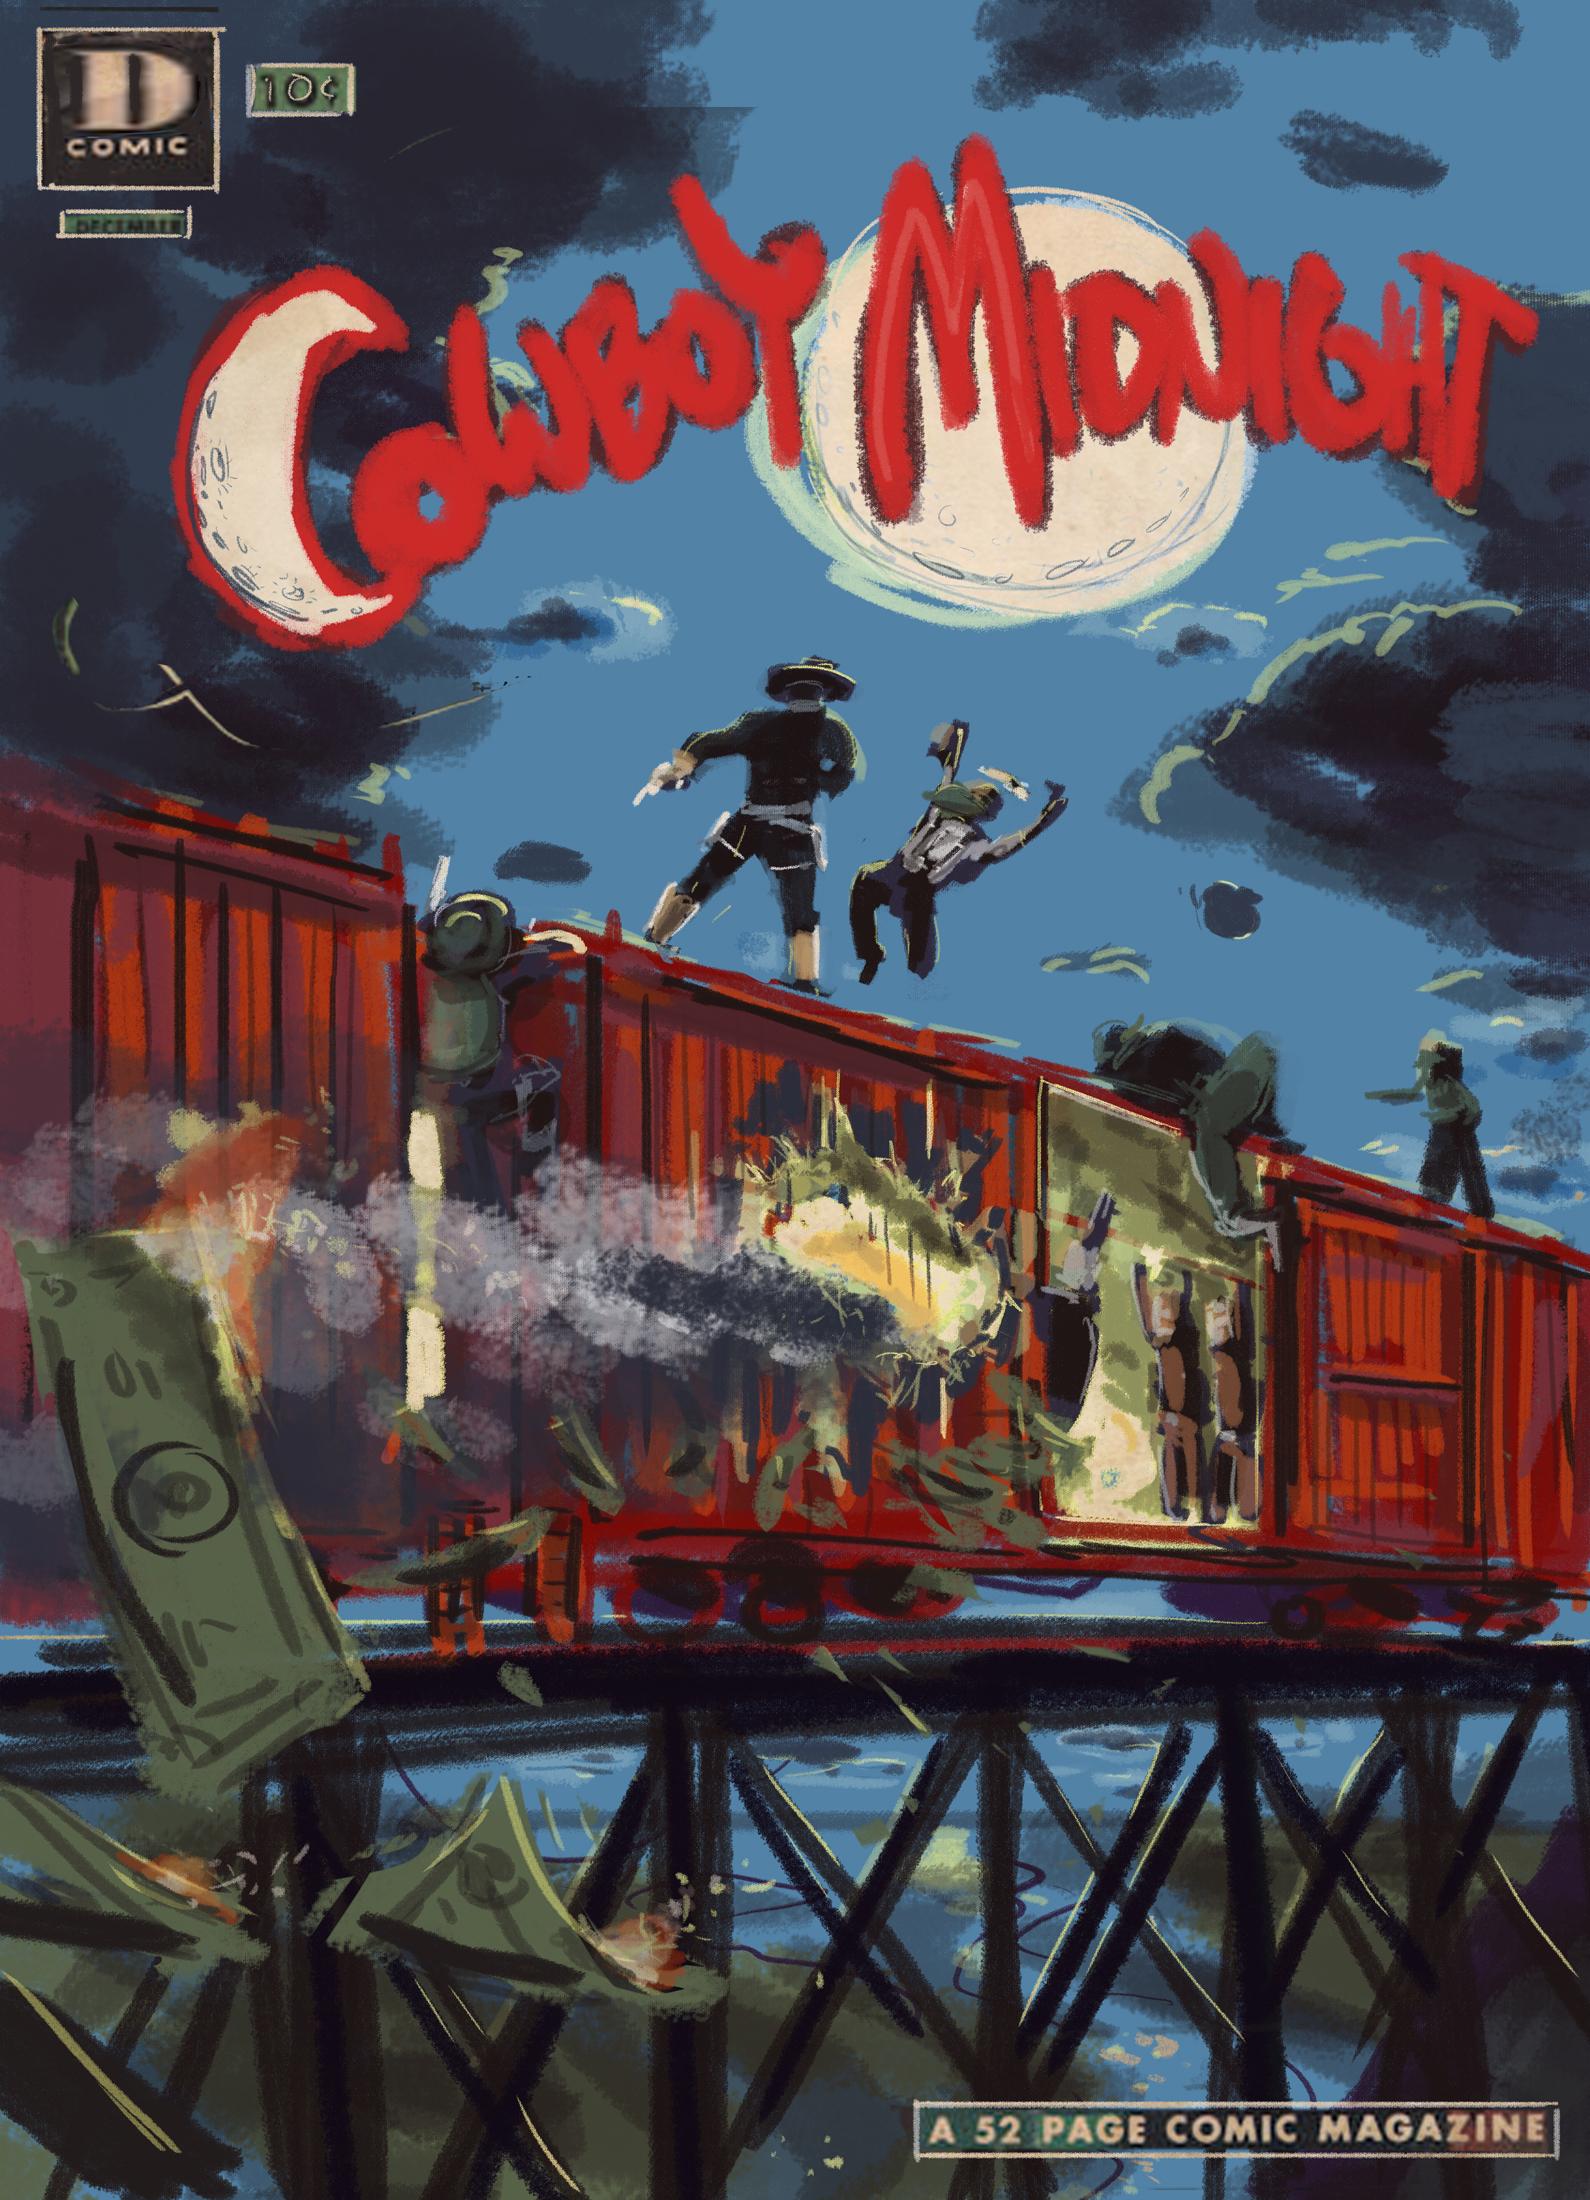 CowboyMidnight_ComicBook-Cover_140410.jpg